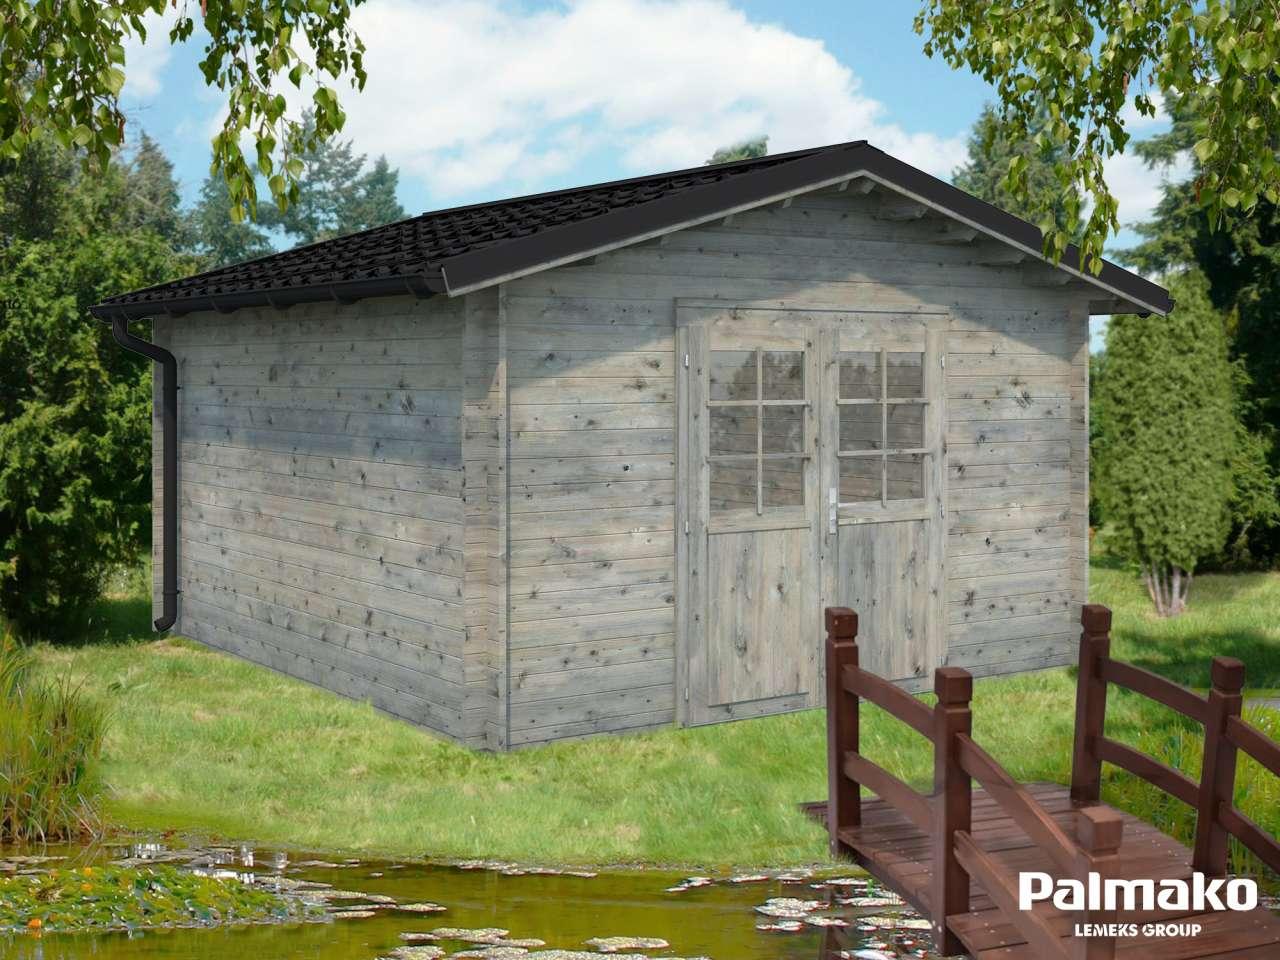 Palmako Gartenhaus Tina 13,5m² mit Metalldach